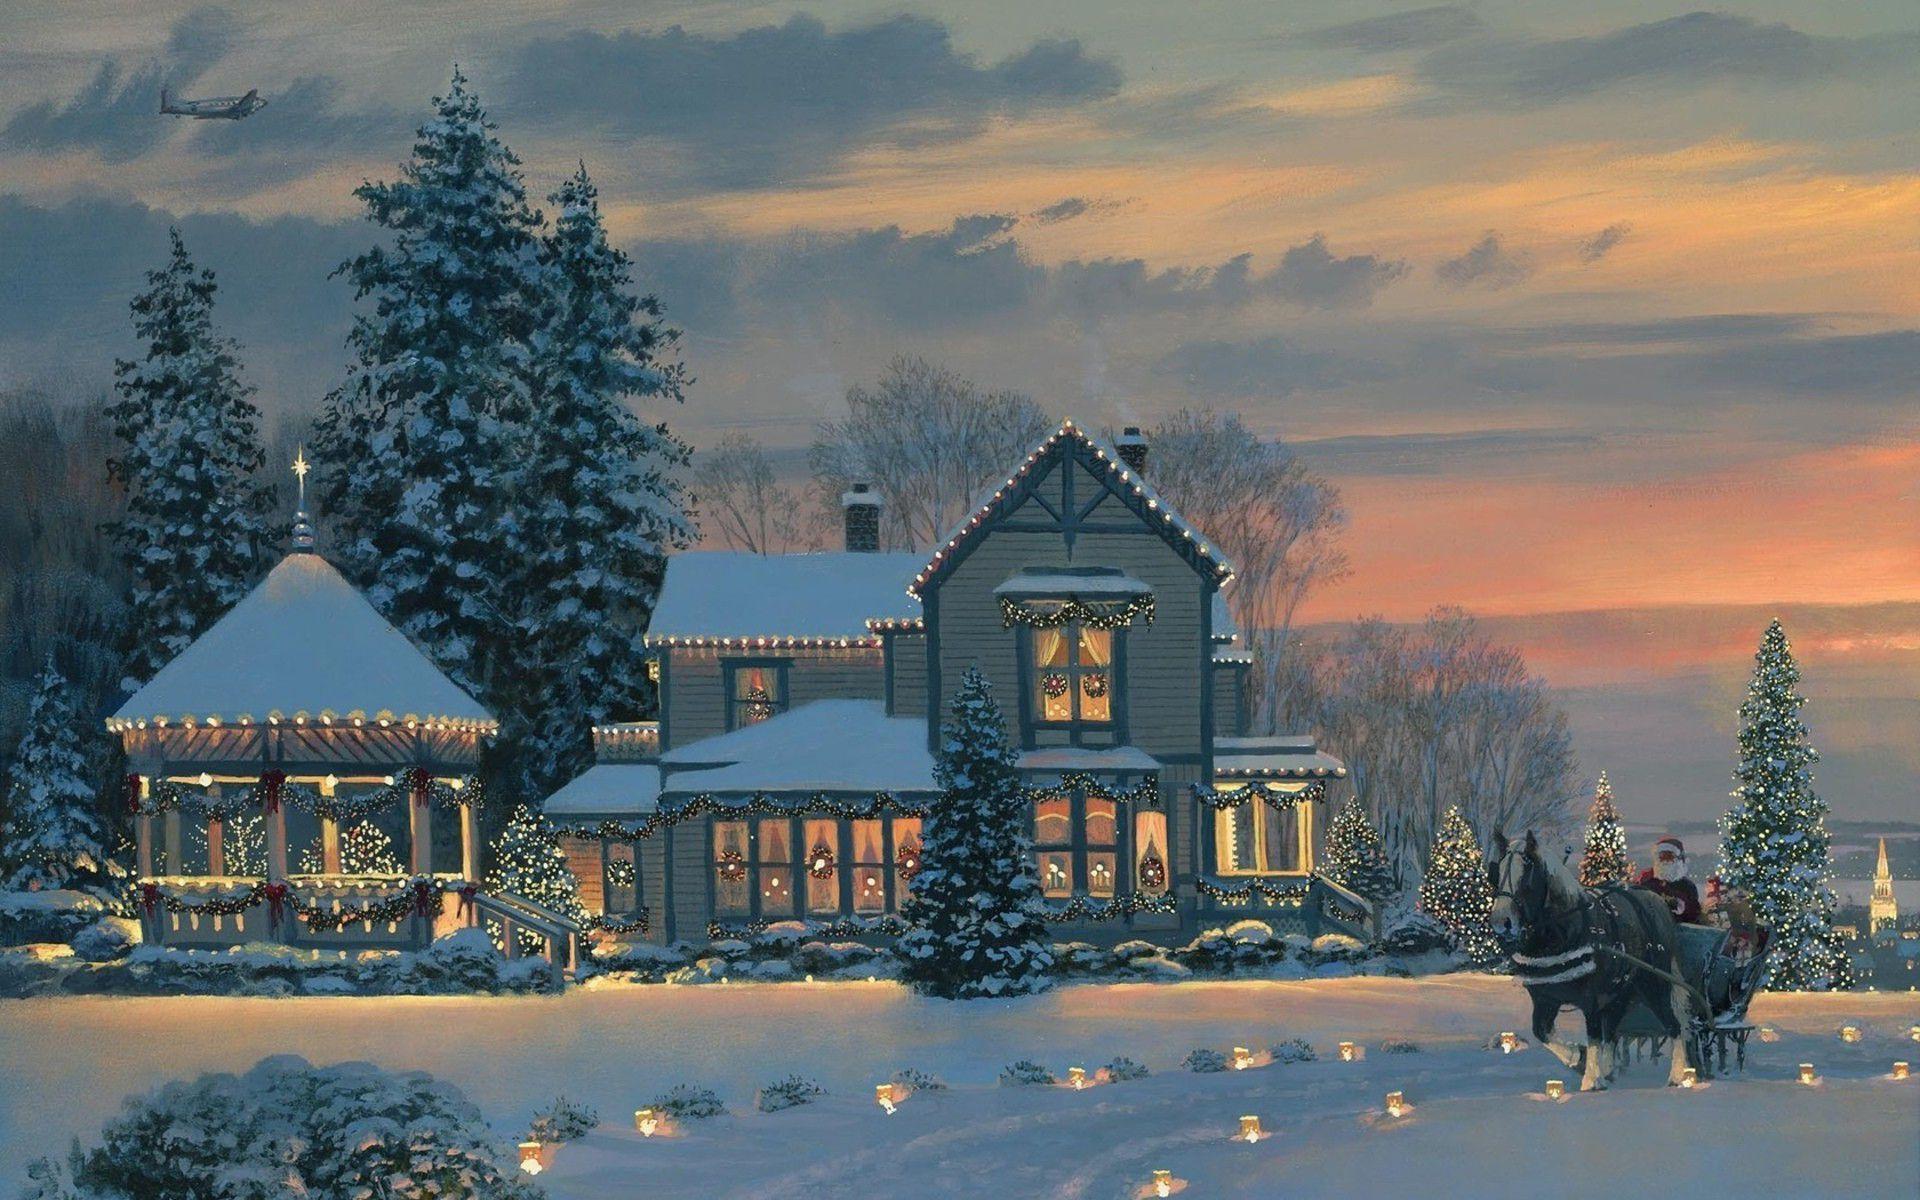 "1920x1080 Animated Christmas Desktop Wallpapers - THIS Wallpaper"">"